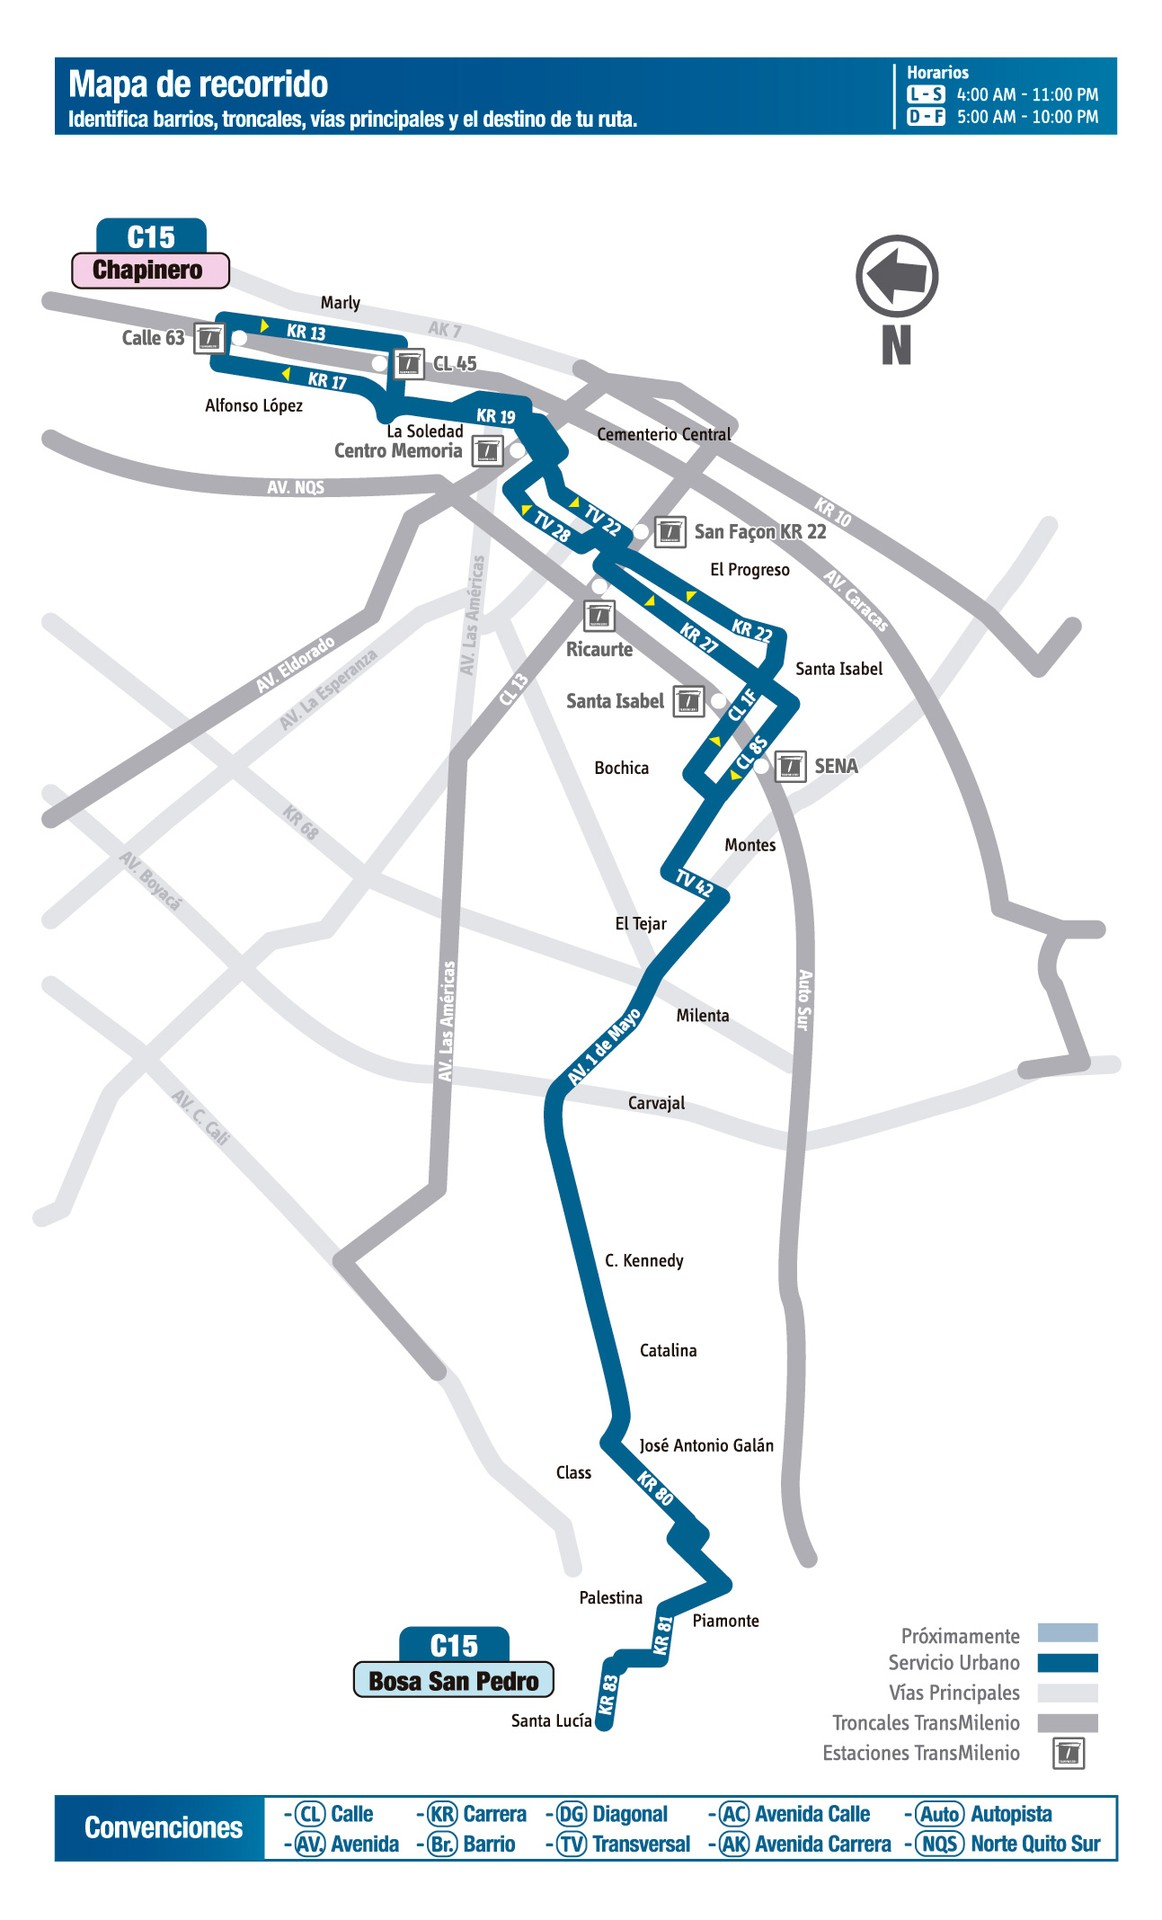 Ruta SITP: C15 Bosa, San Pedro ↔ Chapinero [Urbana] 3